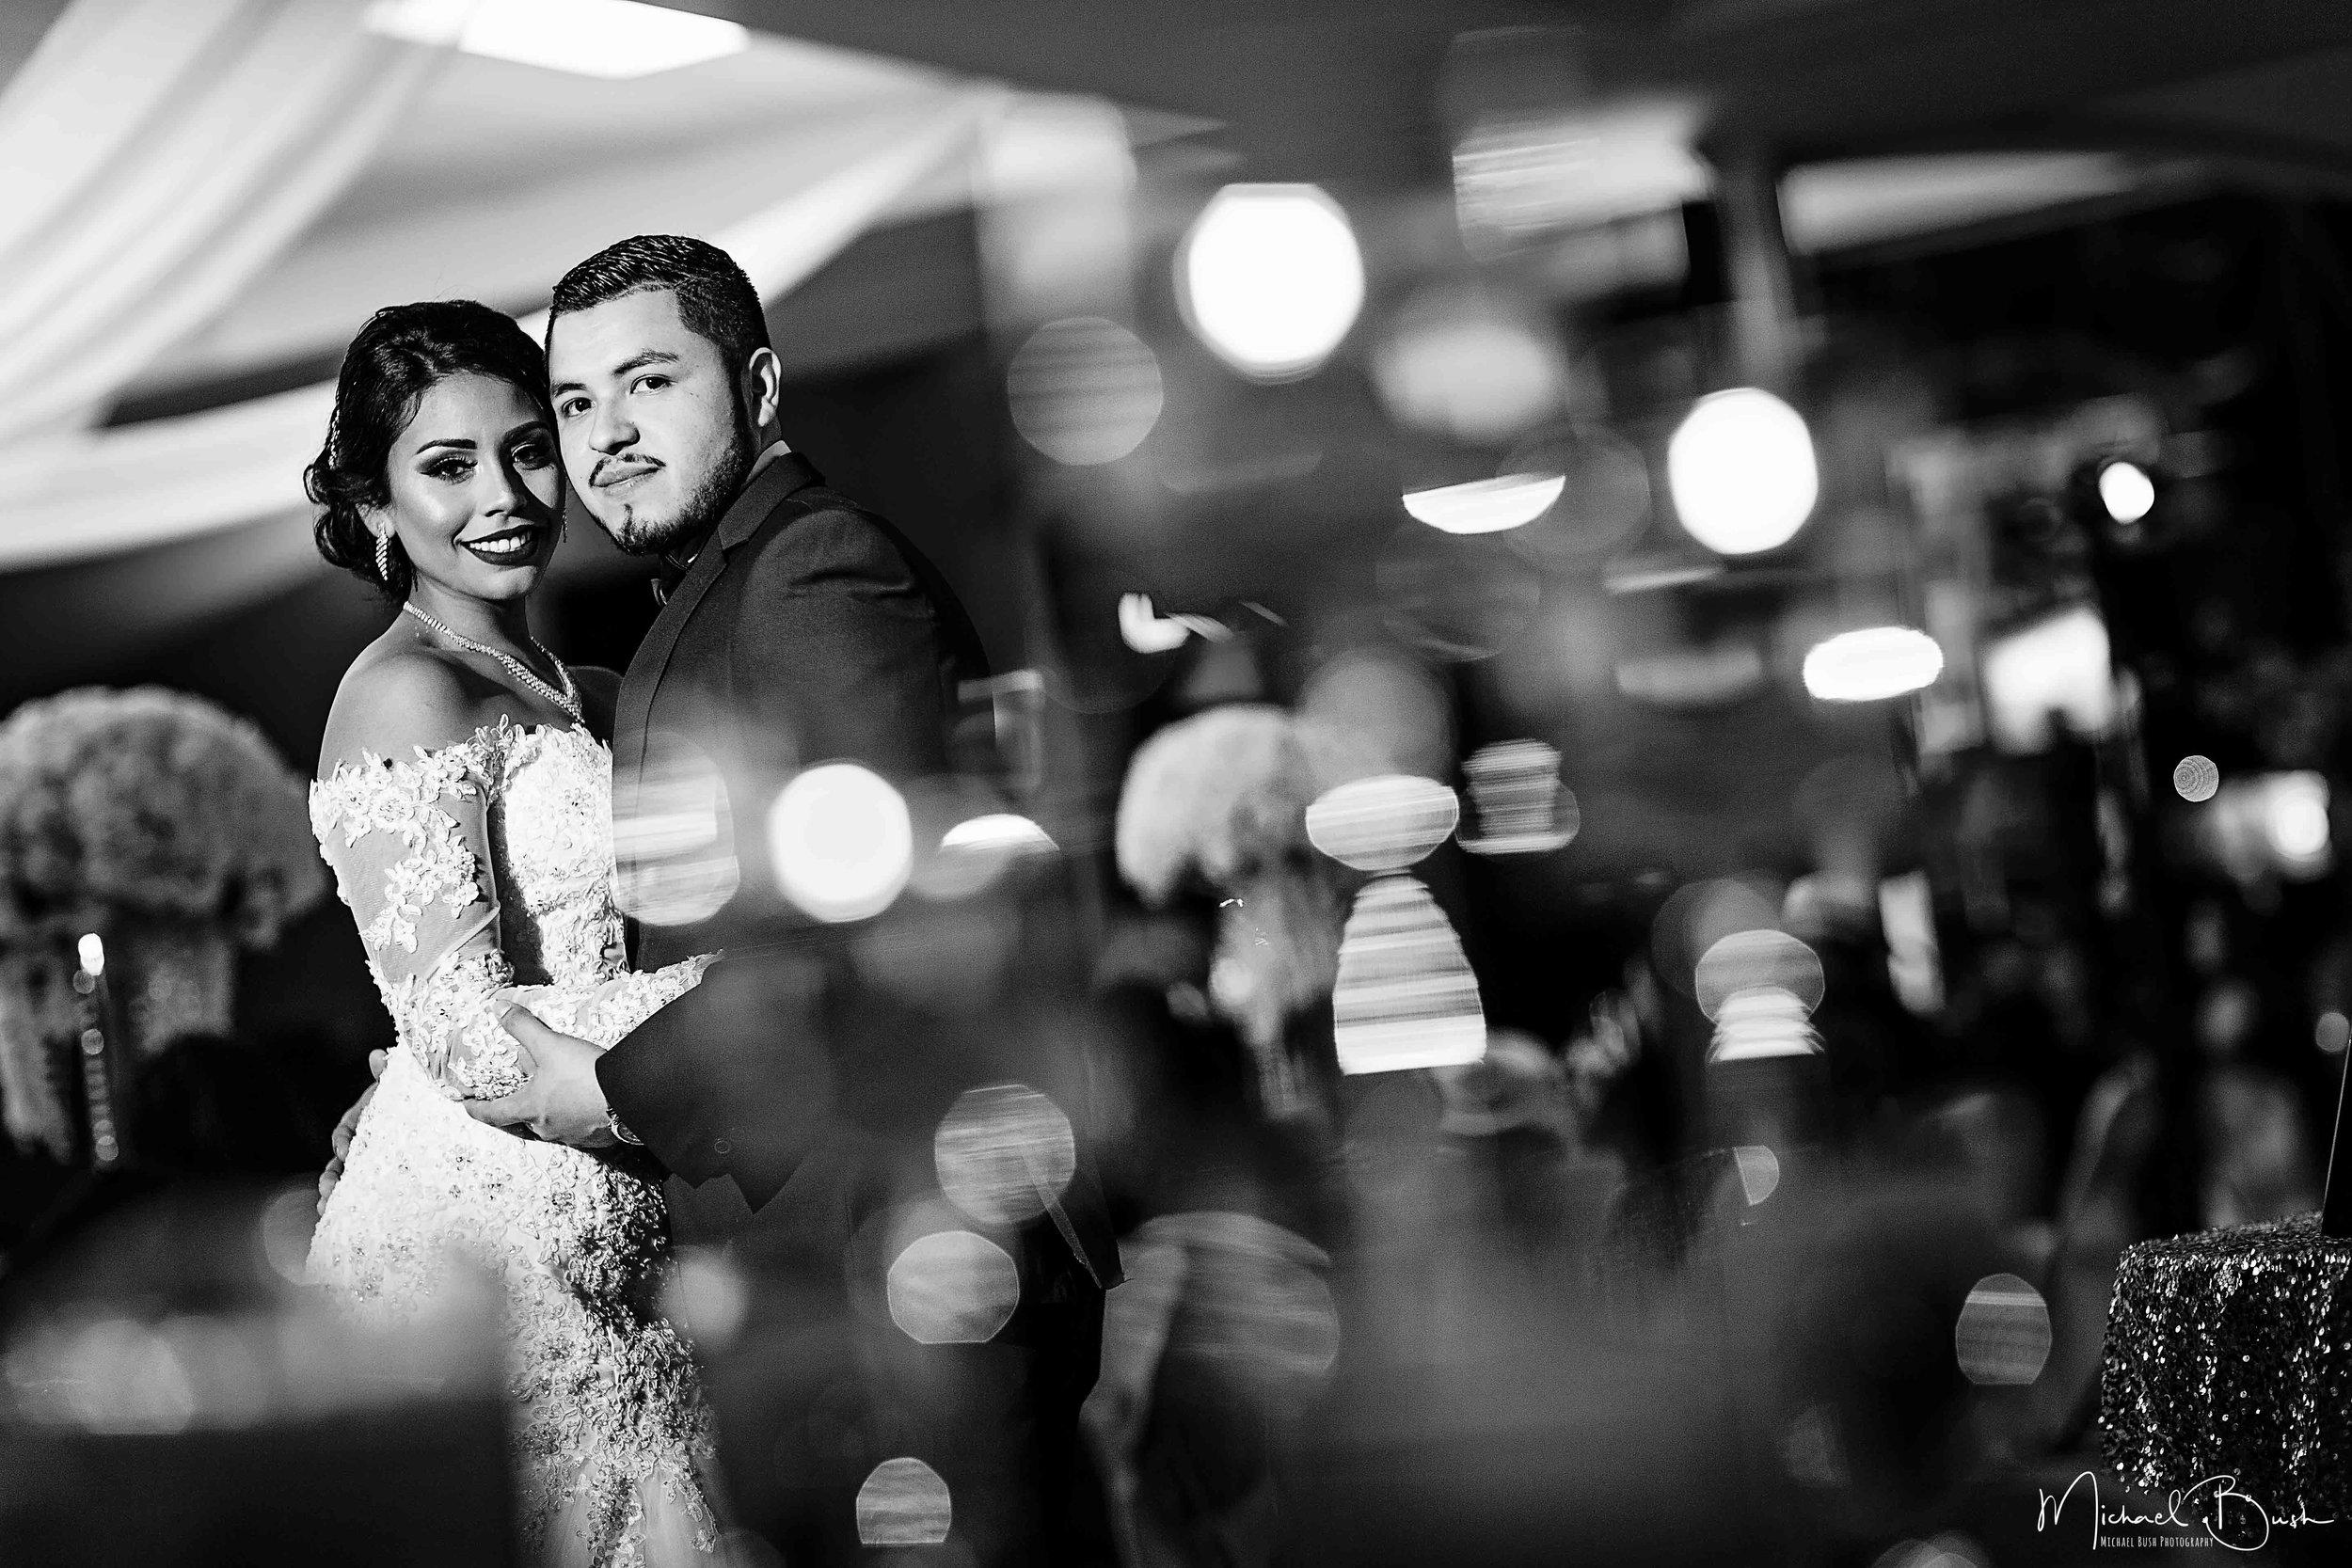 Wedding-Reception-Detials-Fort-Worth-Venue-b&w-kiss-wedding-kiss-ido.jpg